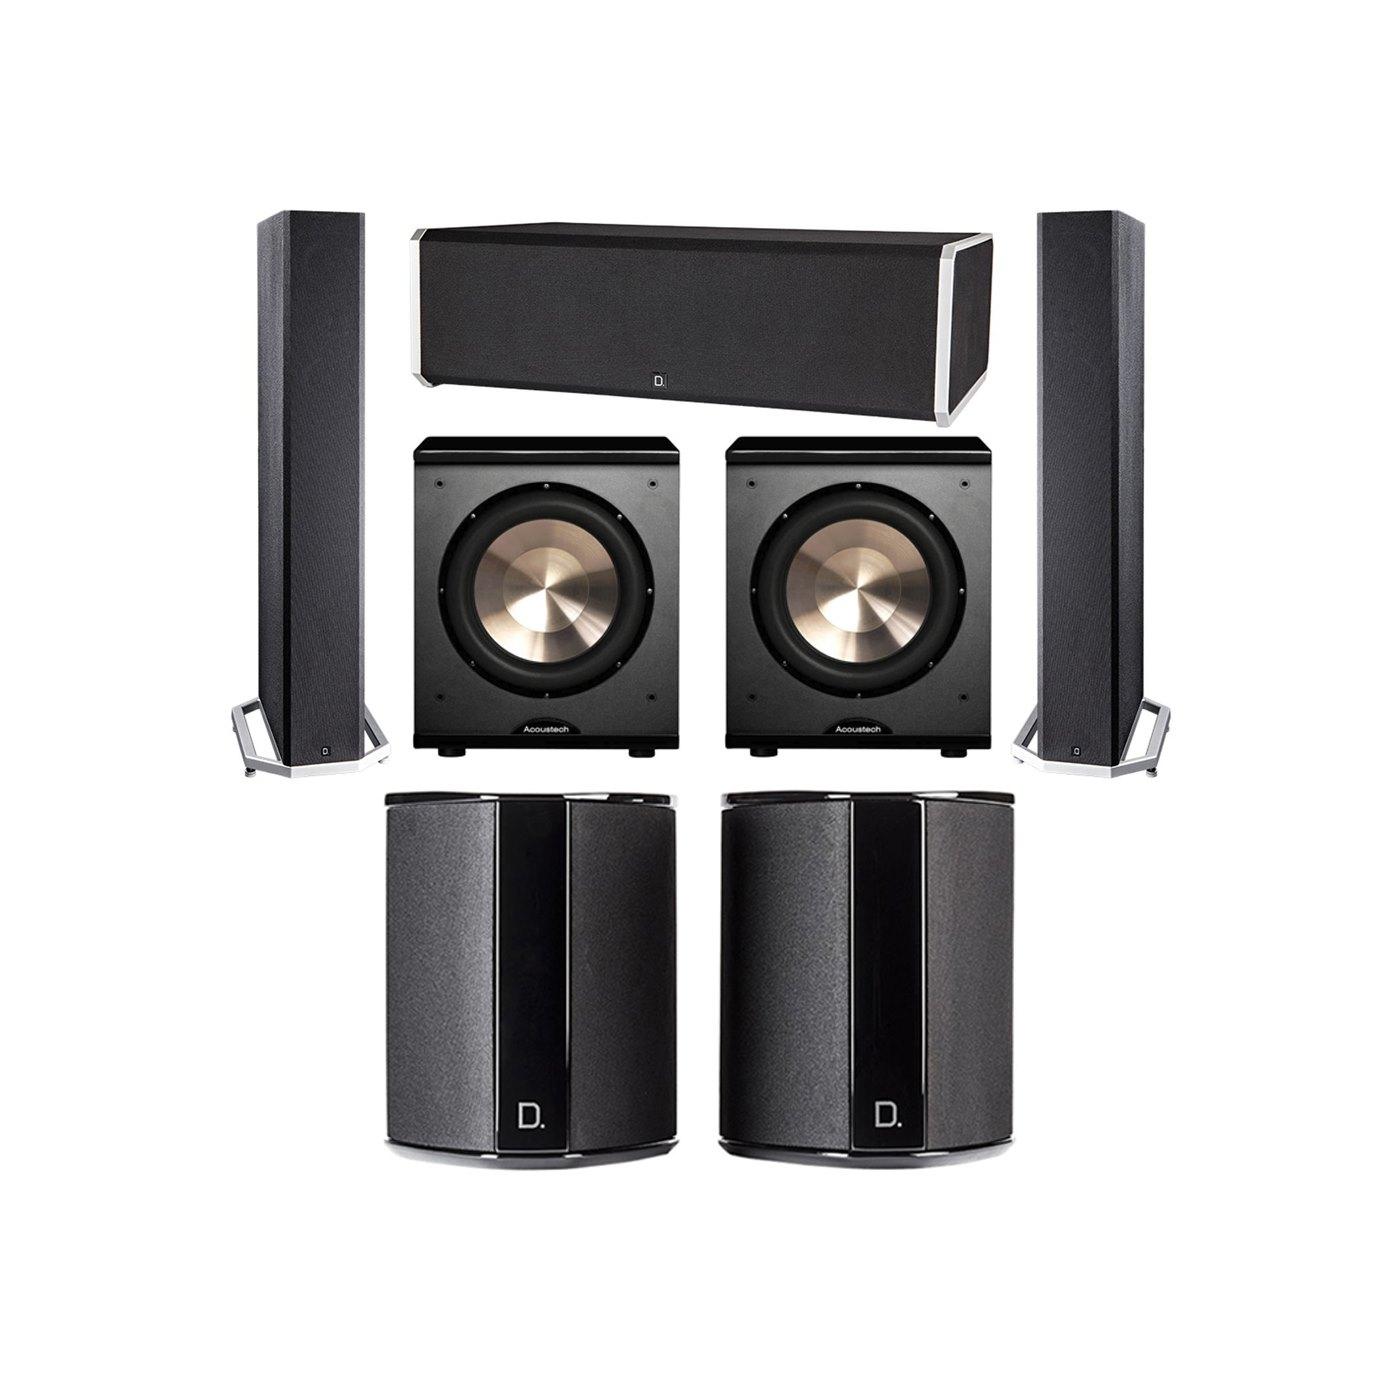 Definitive Technology 5.2 System with 2 BP9040 Tower Speakers, 1 CS9080 Center Channel Speaker, 2 SR9040 Surround Speaker, 2 BIC PL-200 Subwoofer